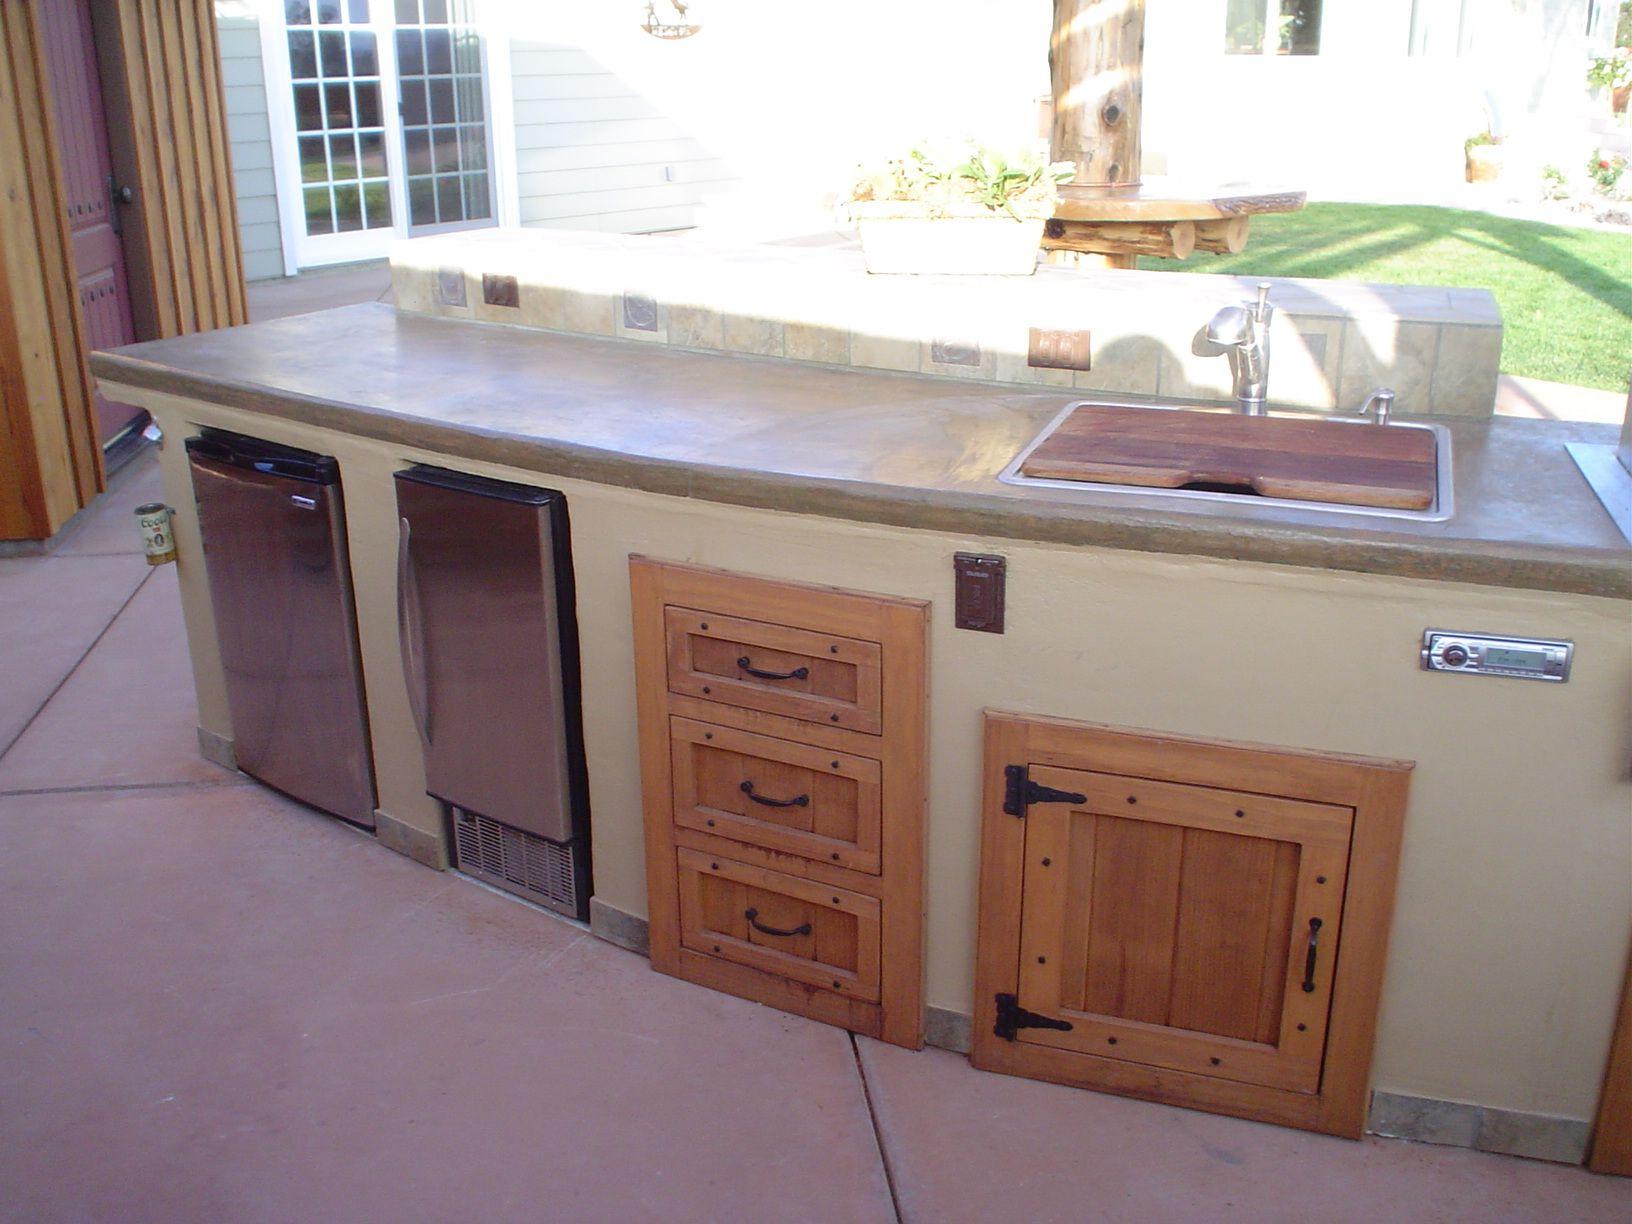 2 Tone Island With Wood Doors Wood Cabinet Doors Outdoor Kitchen Cabinets Modular Outdoor Kitchens